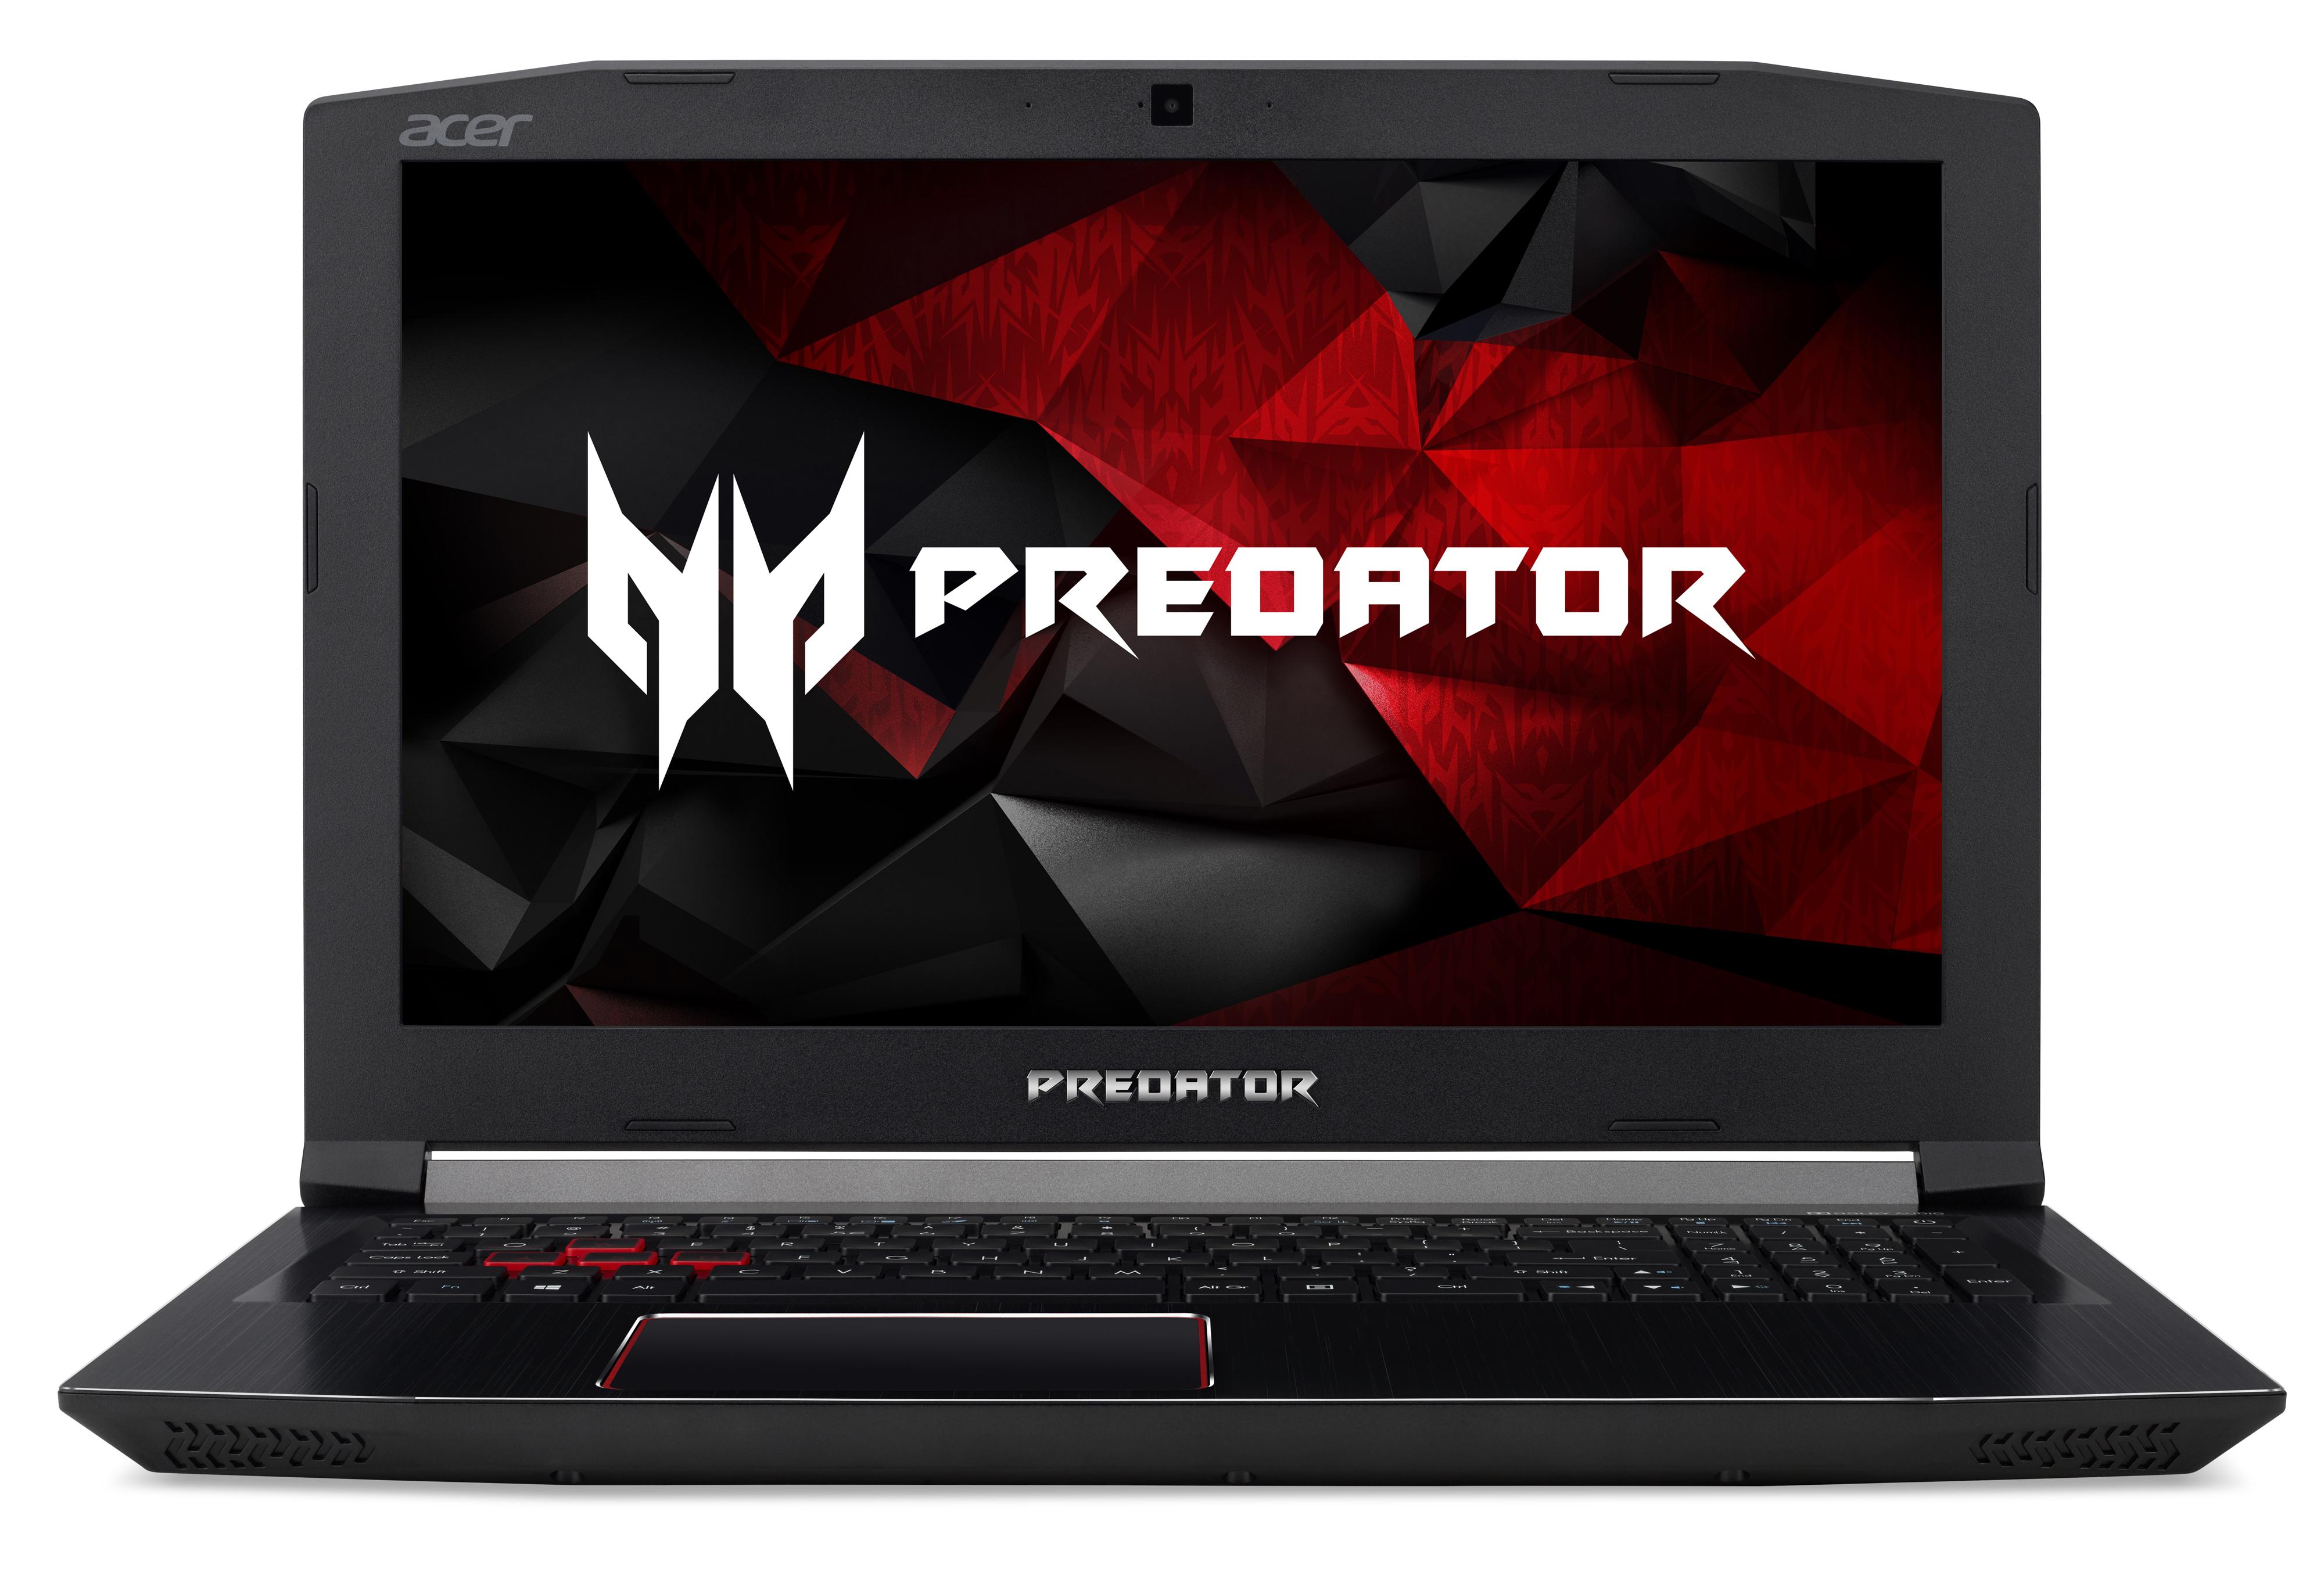 predatorhelios300g3-571_572_573_predator-wp_01.jpg